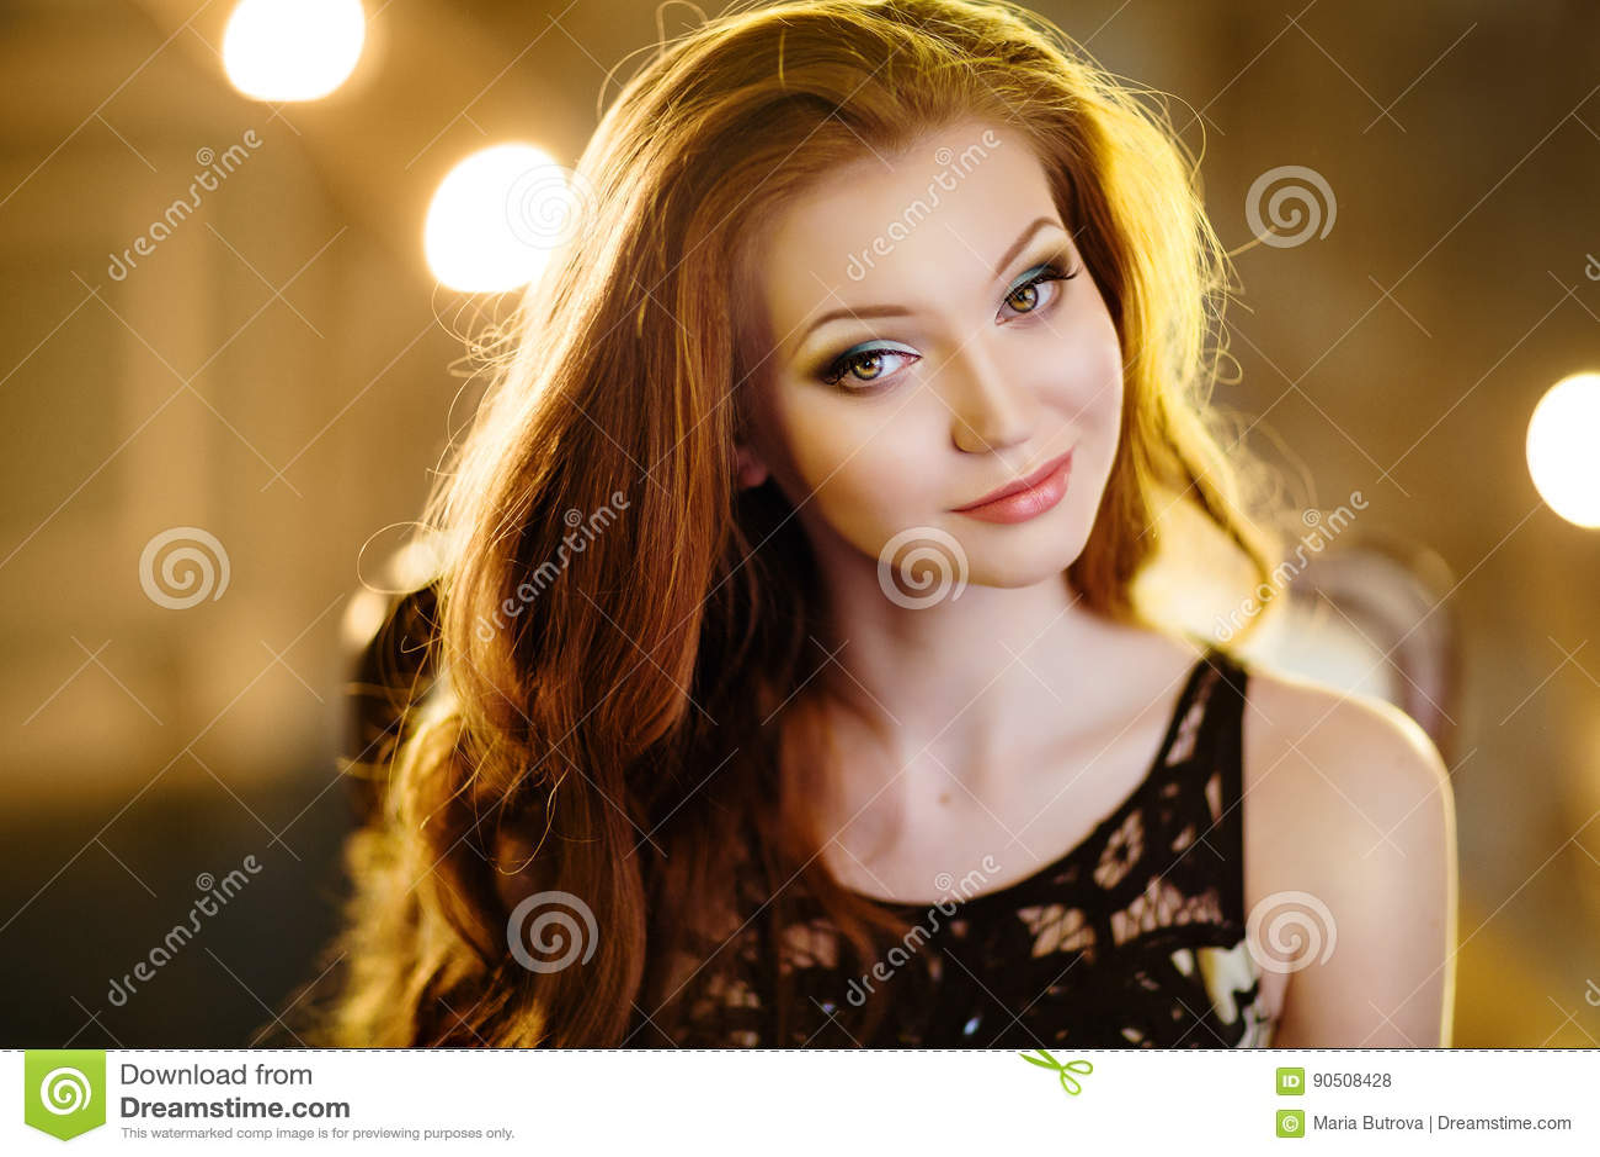 very nice girl photo